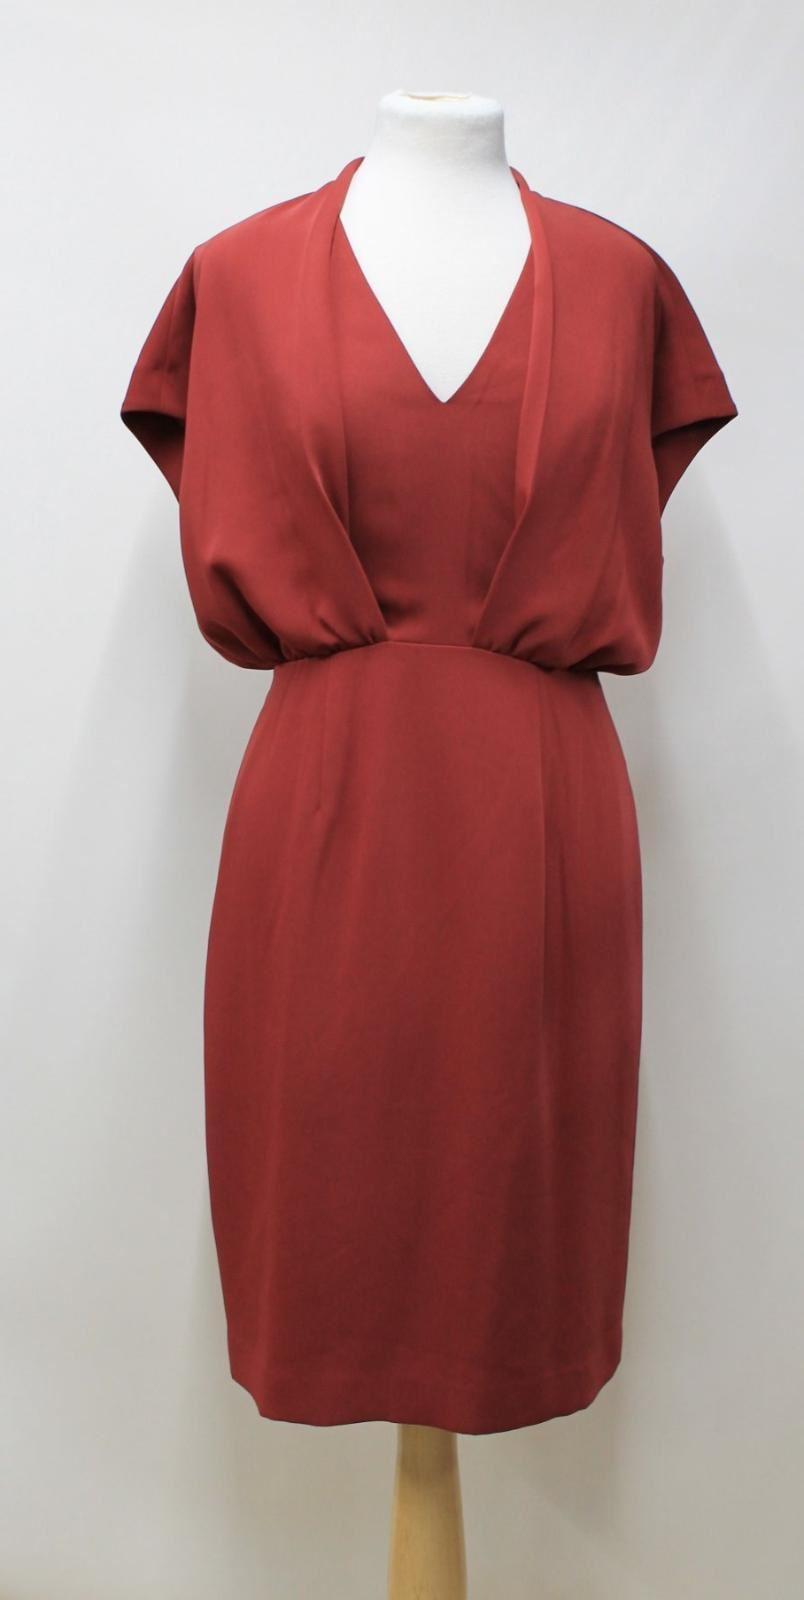 REISS-Ladies-Rust-Red-Sleeveless-V-Neck-Panelled-Shift-Style-Dress-Size-UK10